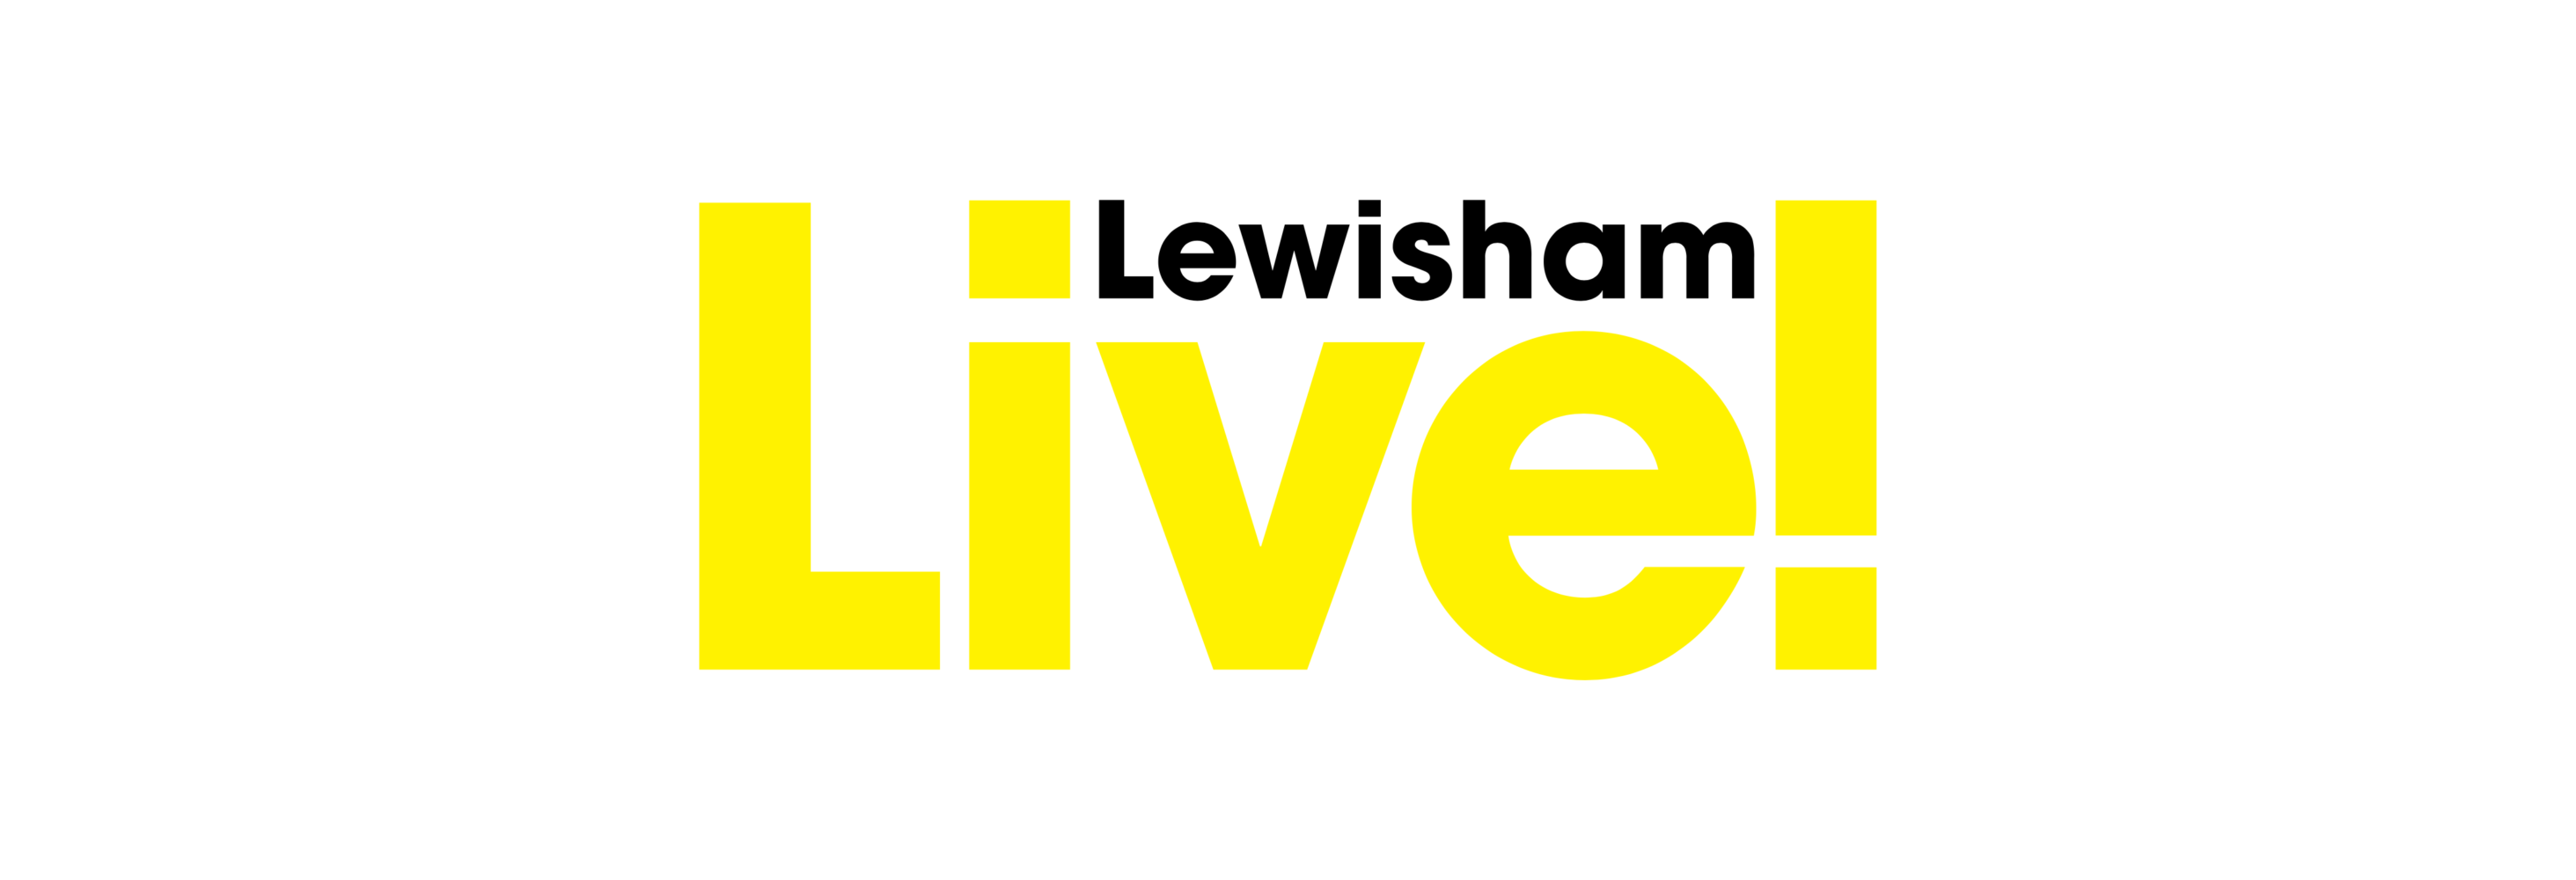 Lewisham Live Festival logo